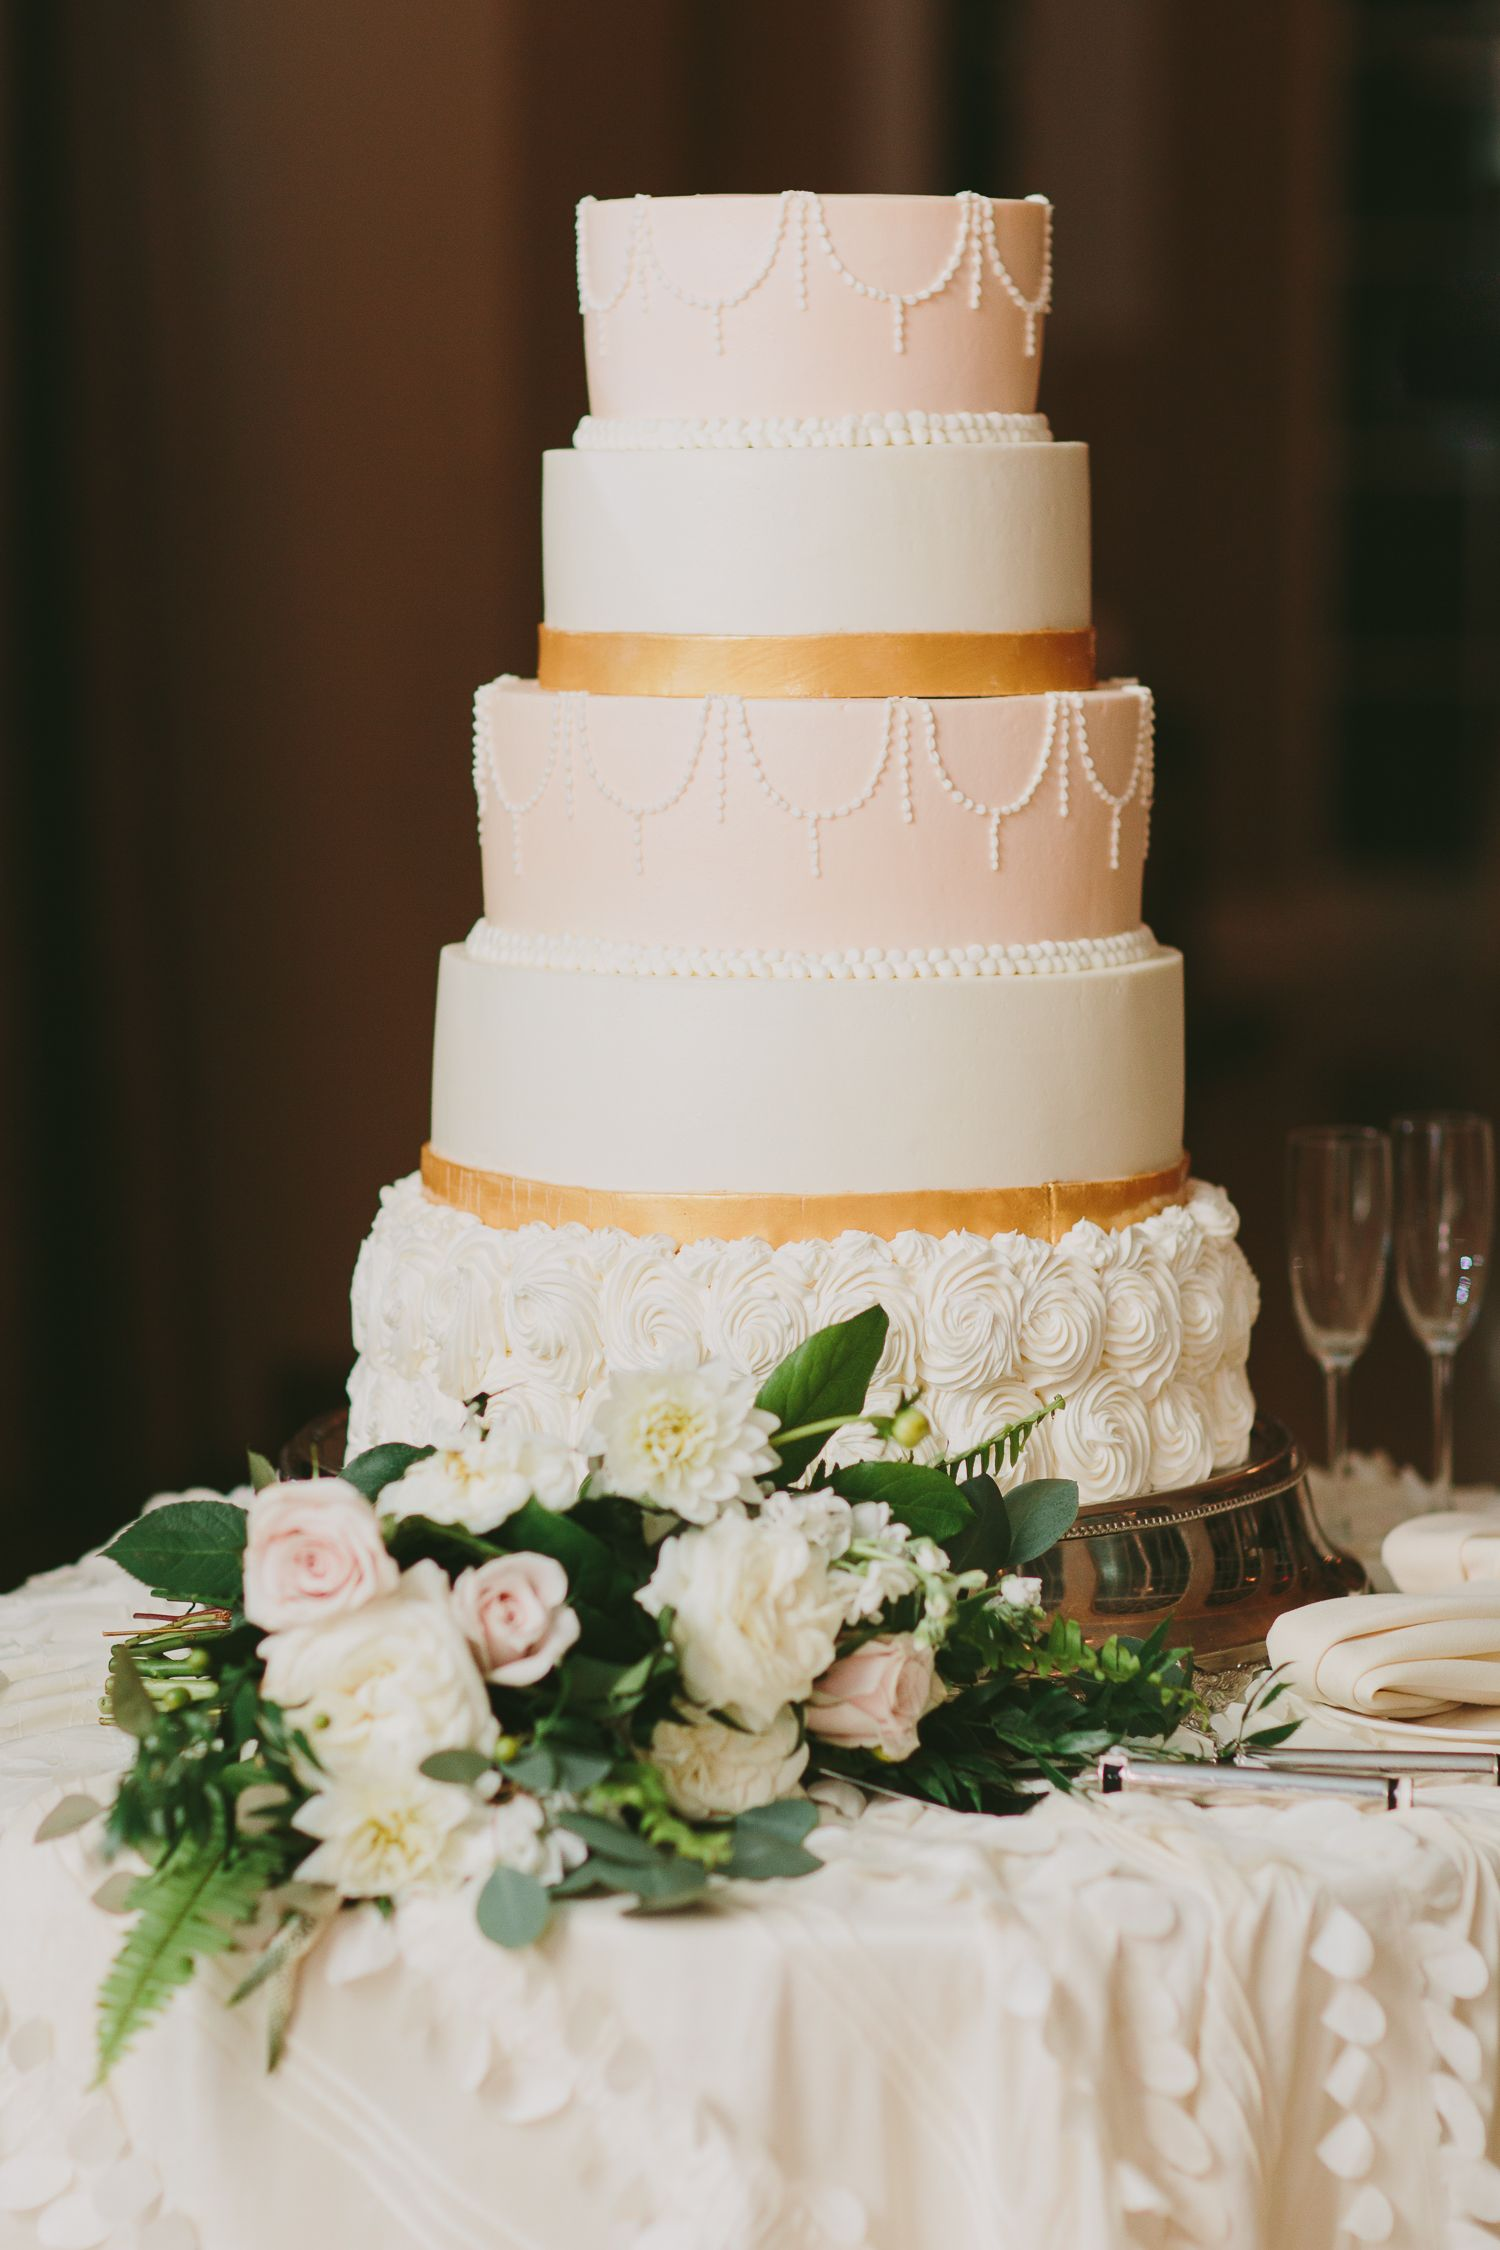 Beautiful Persian American Wedding Ideas - Glittery Bride | Wedding cake  centerpieces, Wedding cake options, Tiered wedding cake